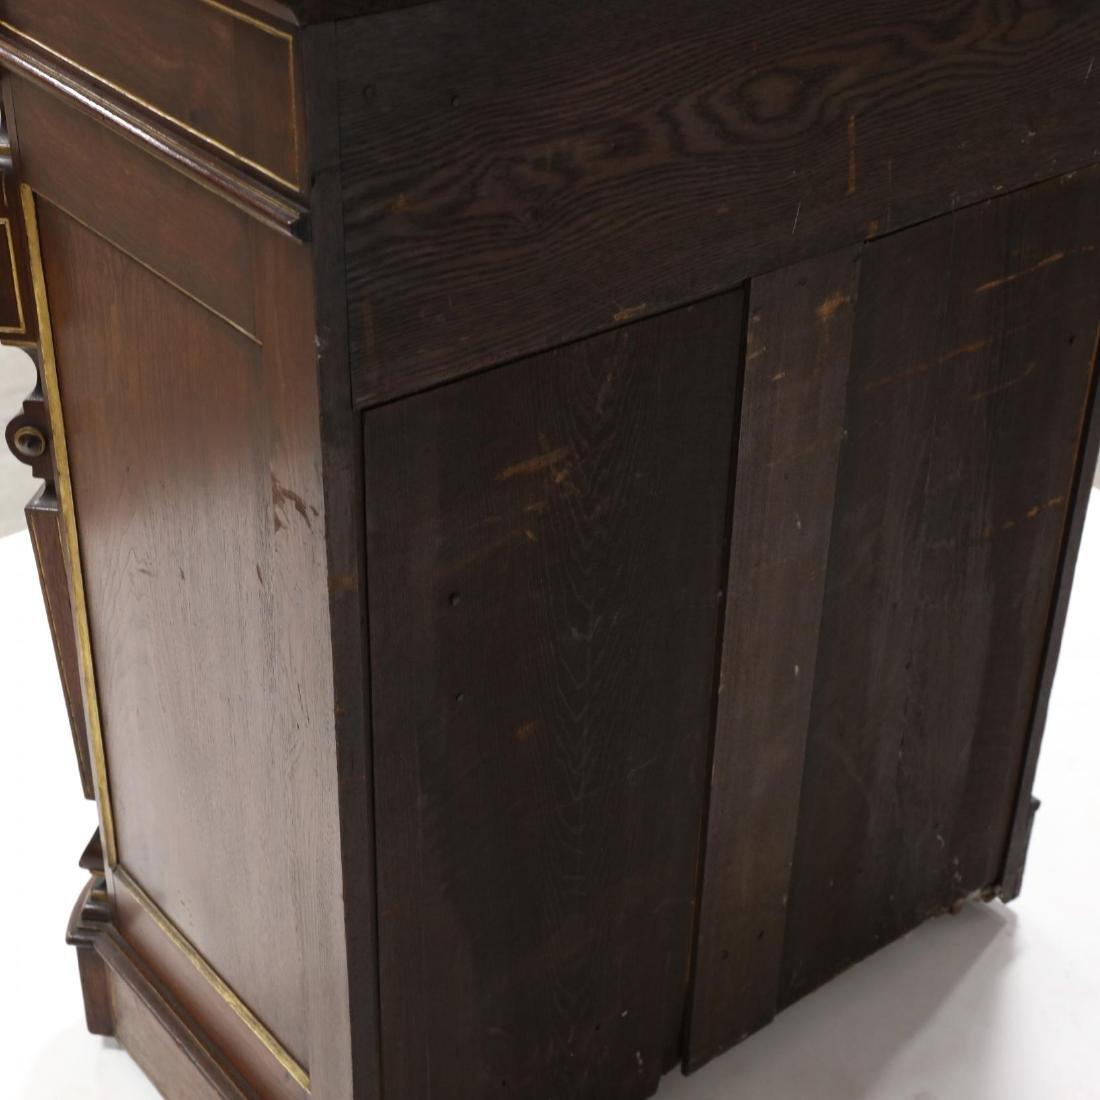 American Renaissance Revival Marble Top Cabinet - 6